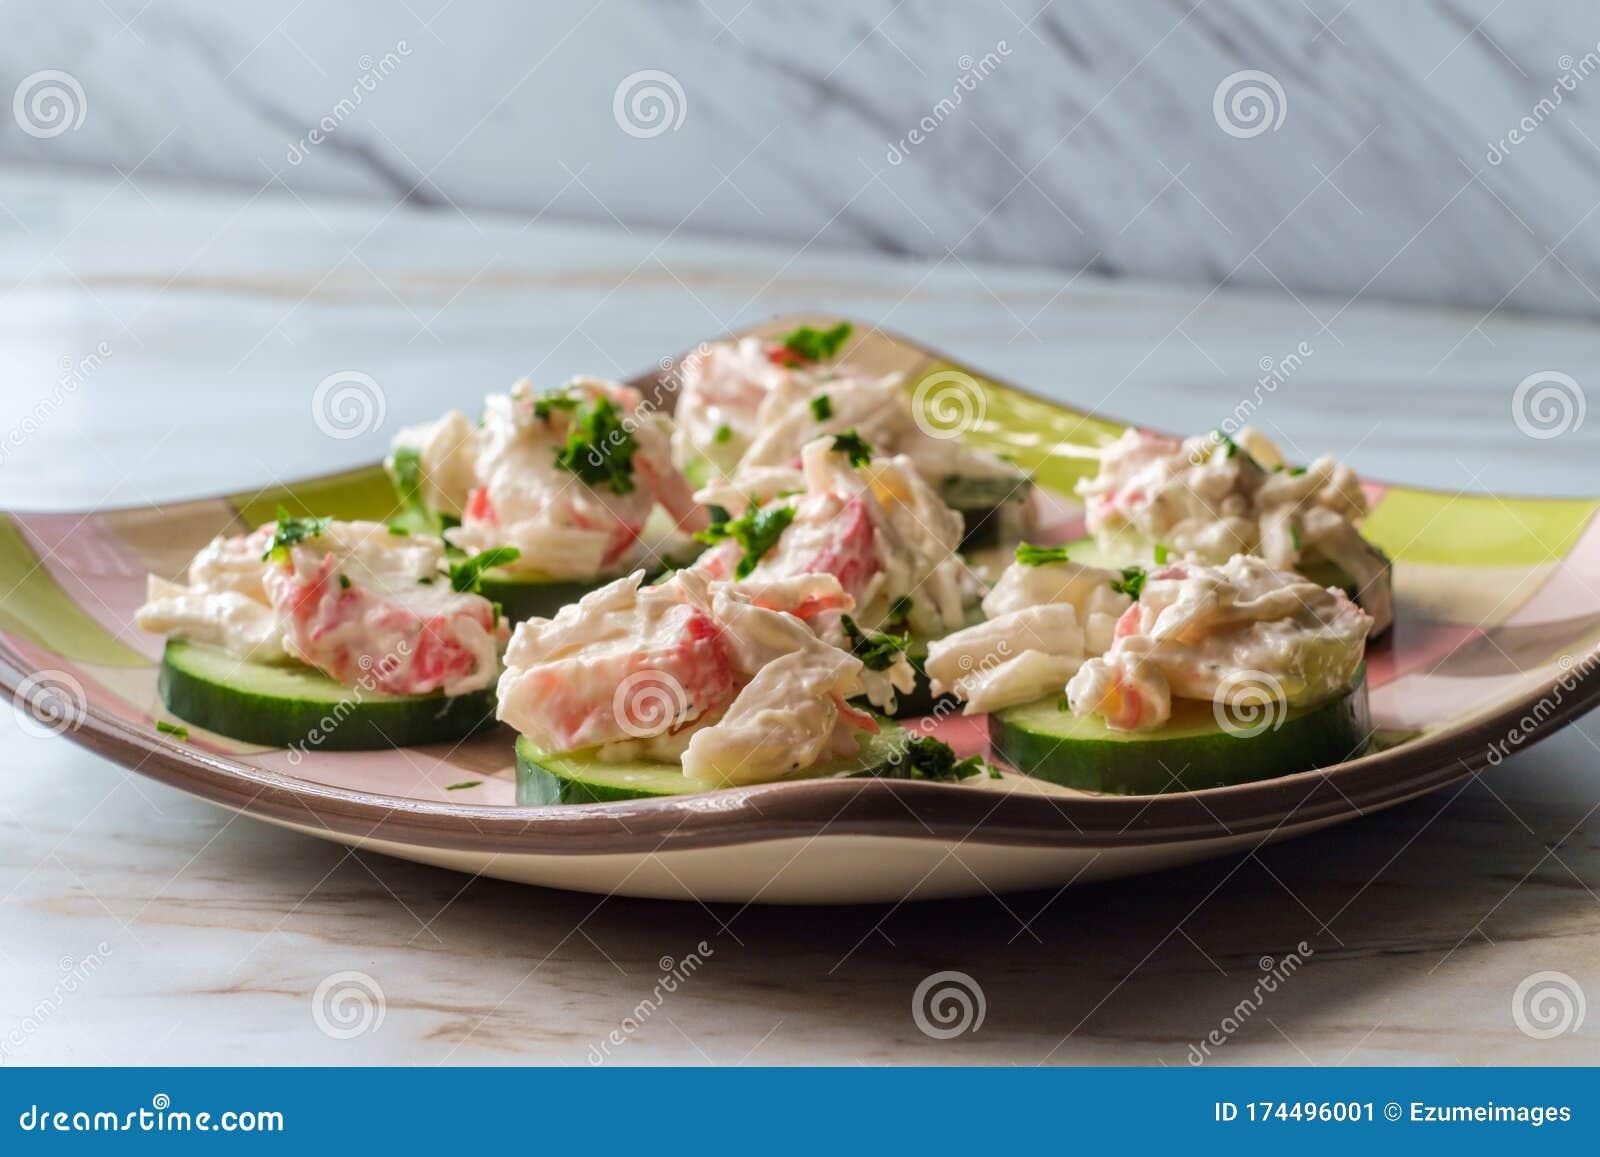 Seafood Salad Cucumber Slices Stock Image Image Of Salad Nutrition 174496001